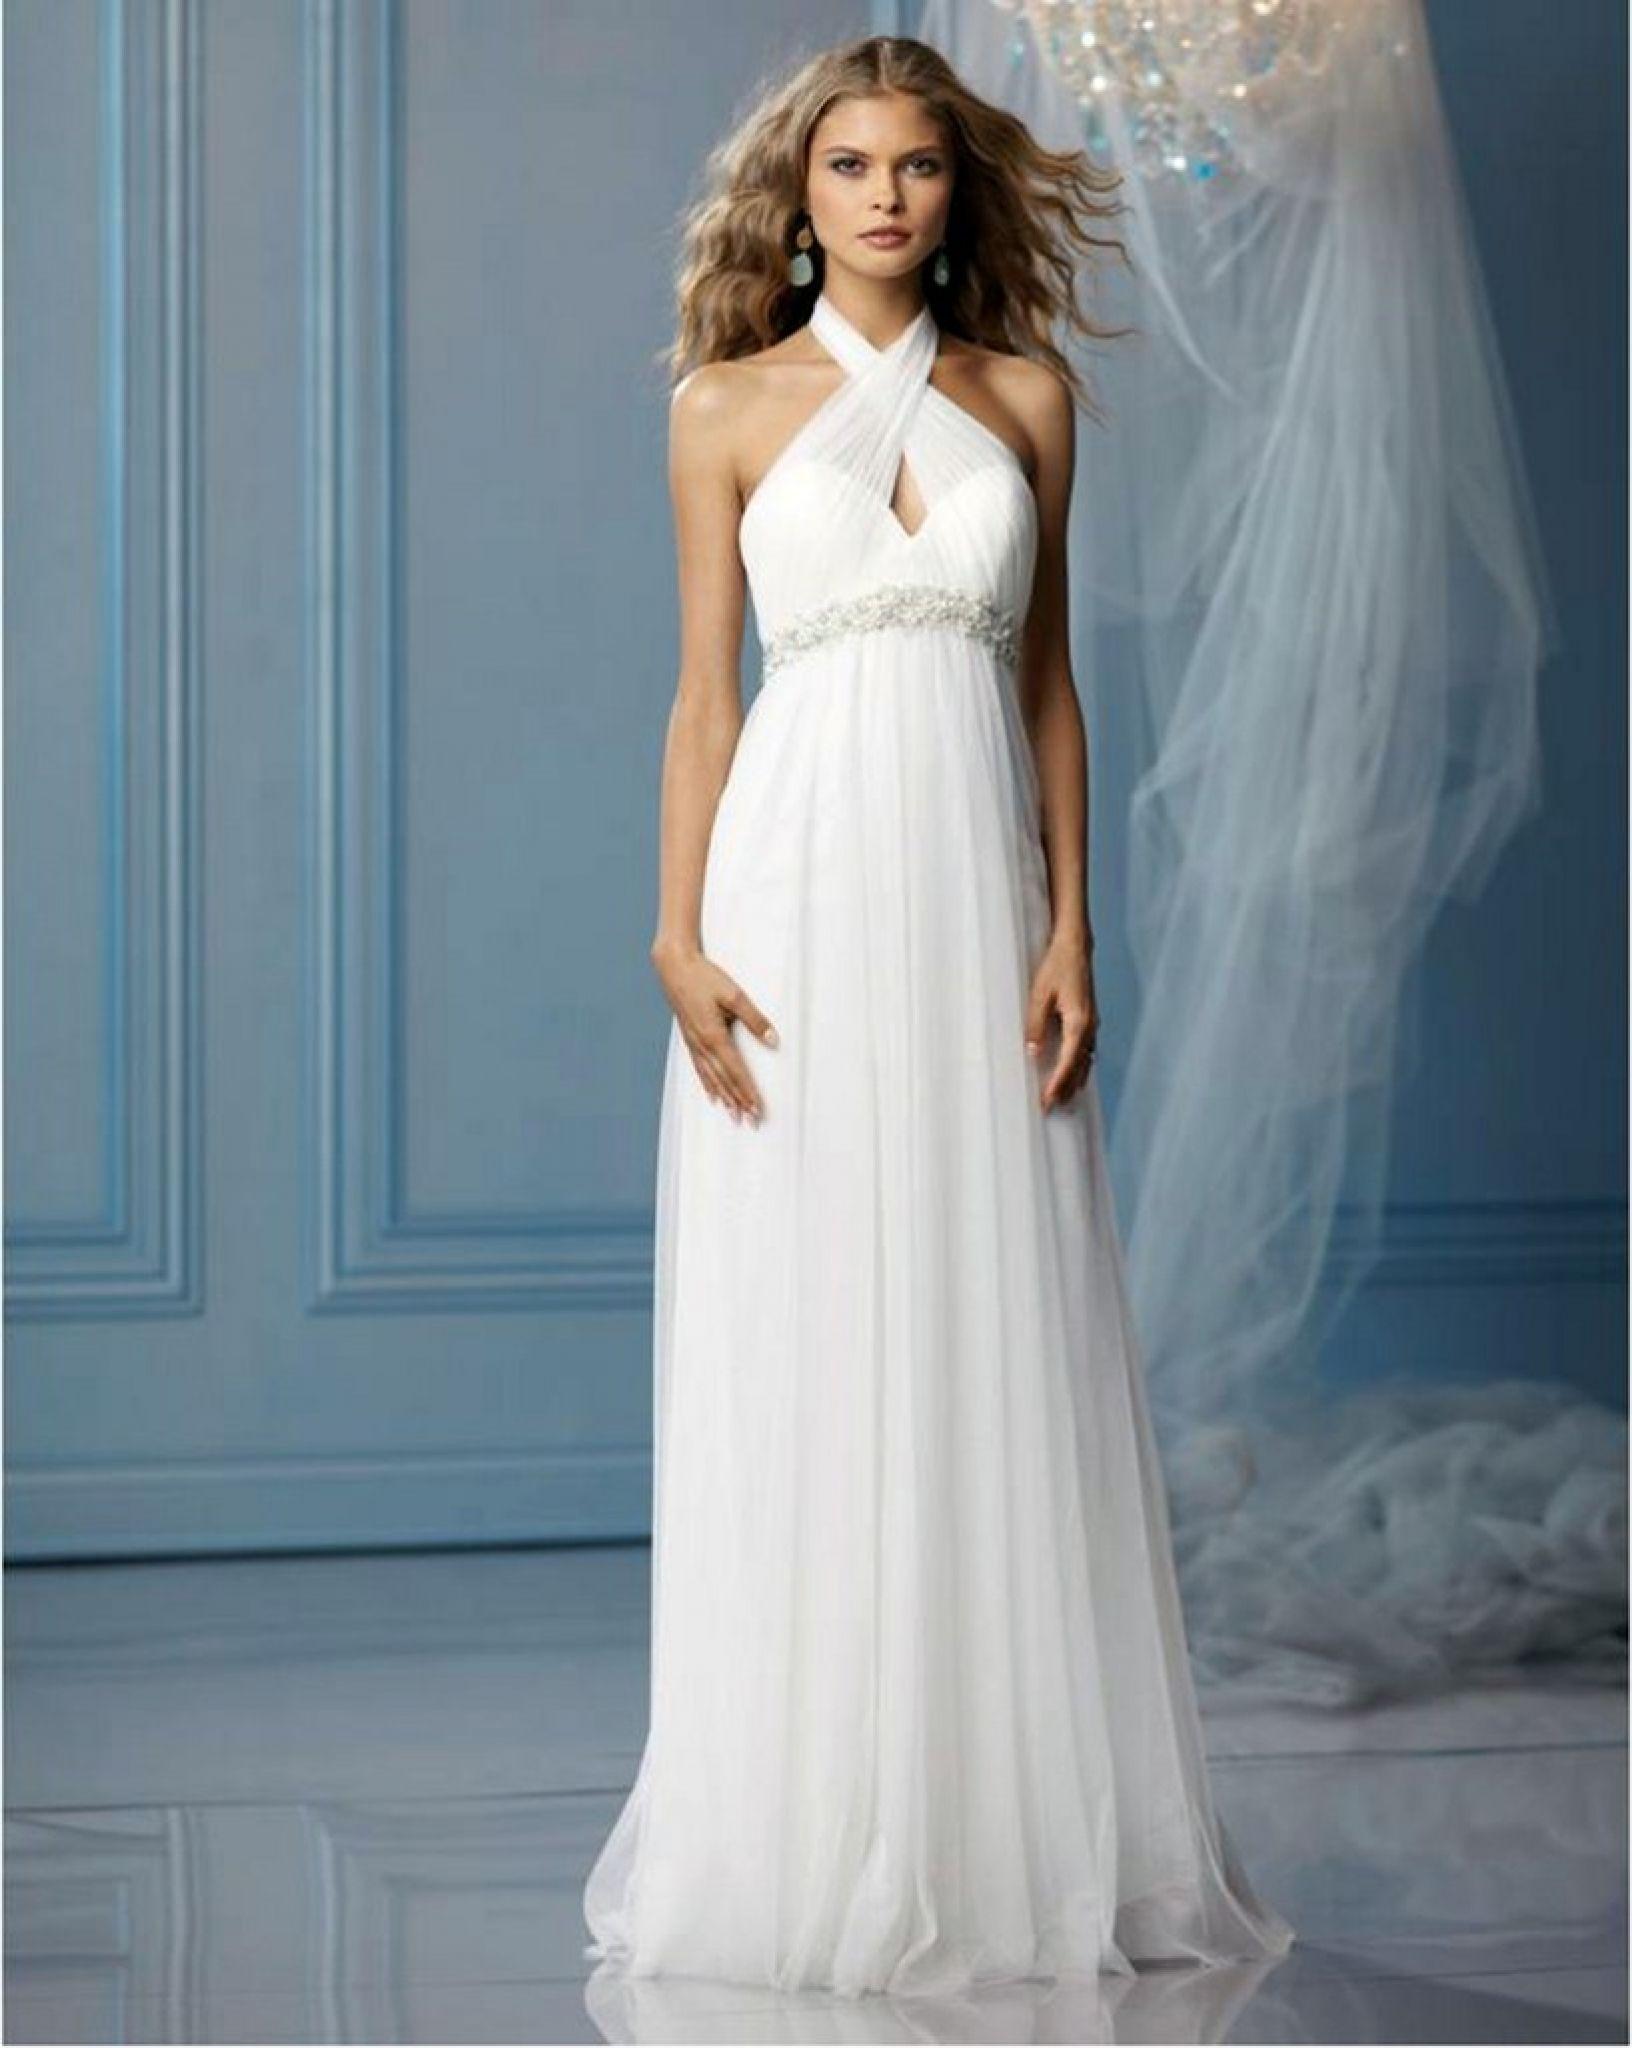 wedding dresses under 300 - dressy dresses for weddings Check more ...